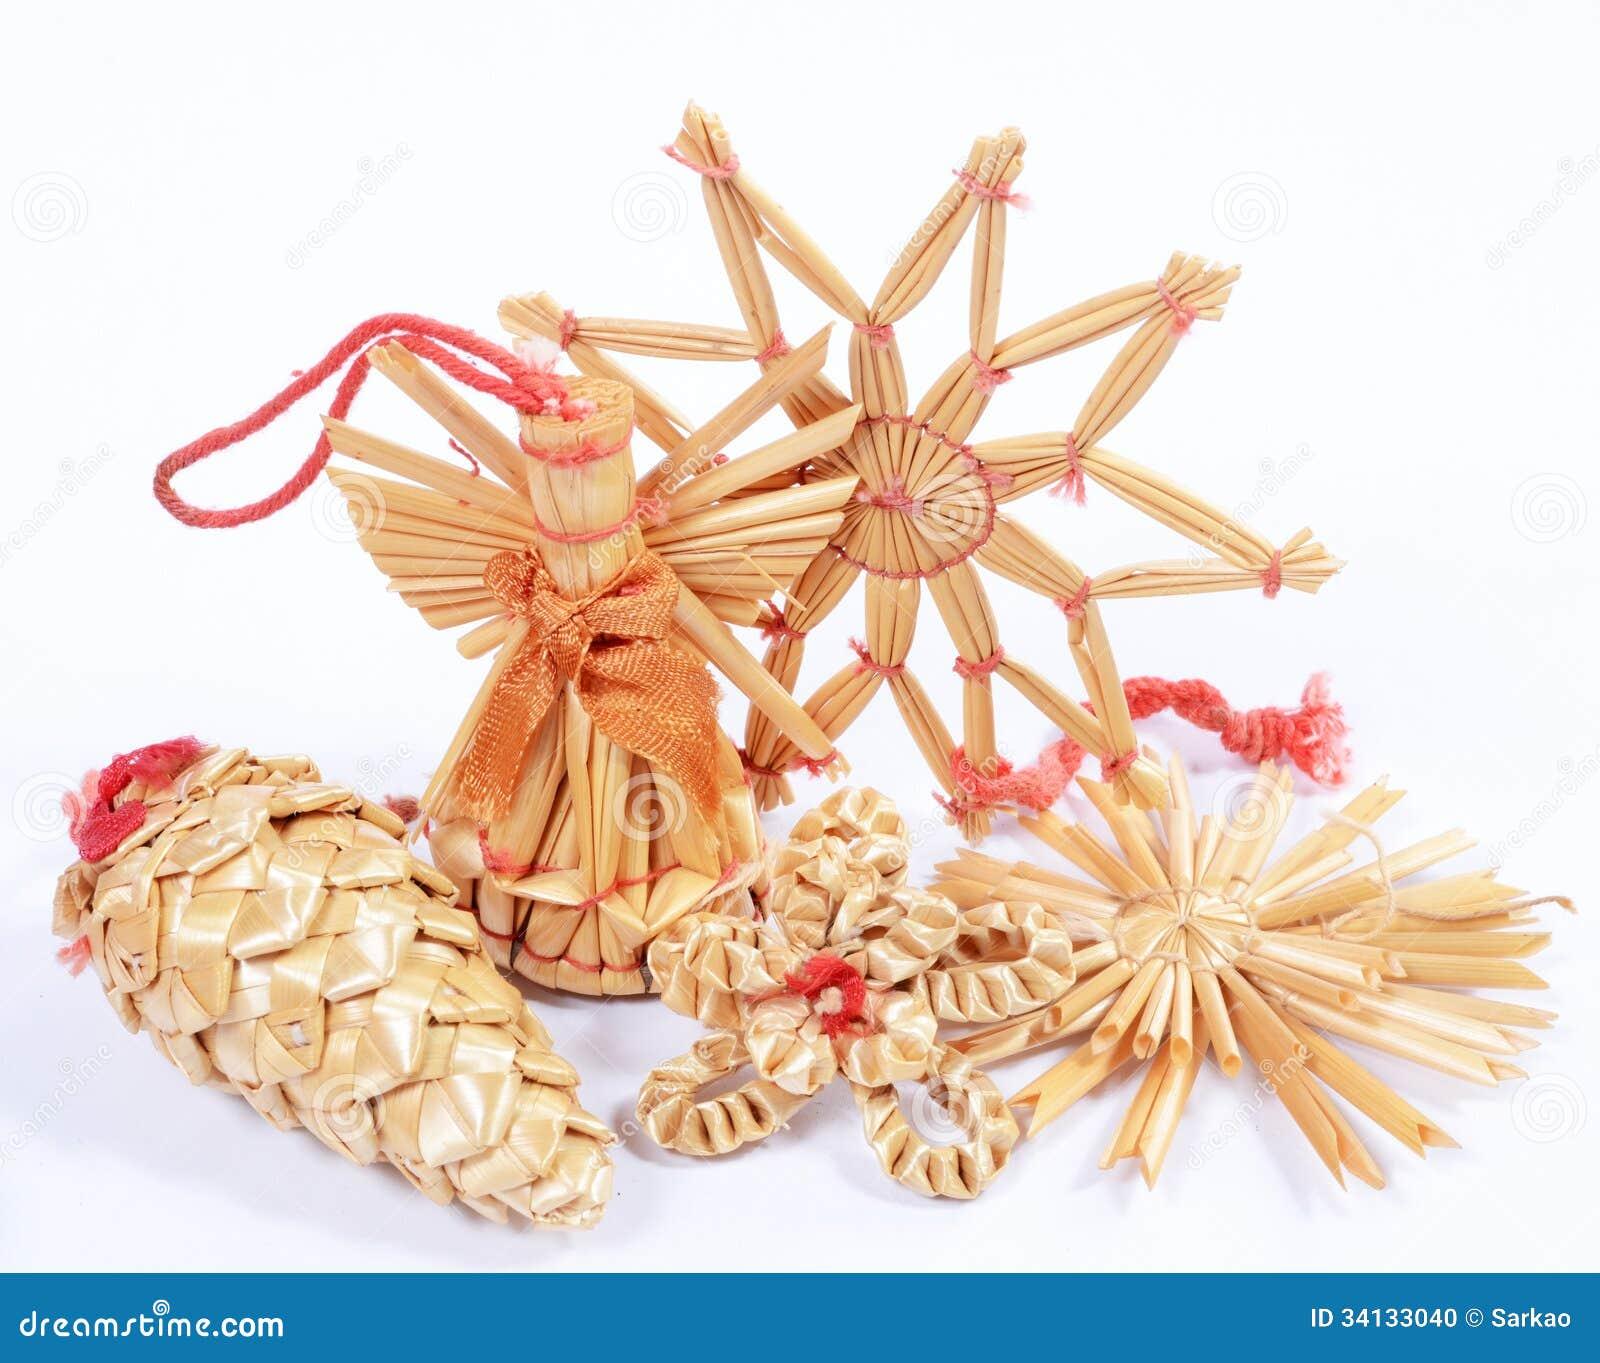 Christmas Straw Decorations Stock Photo